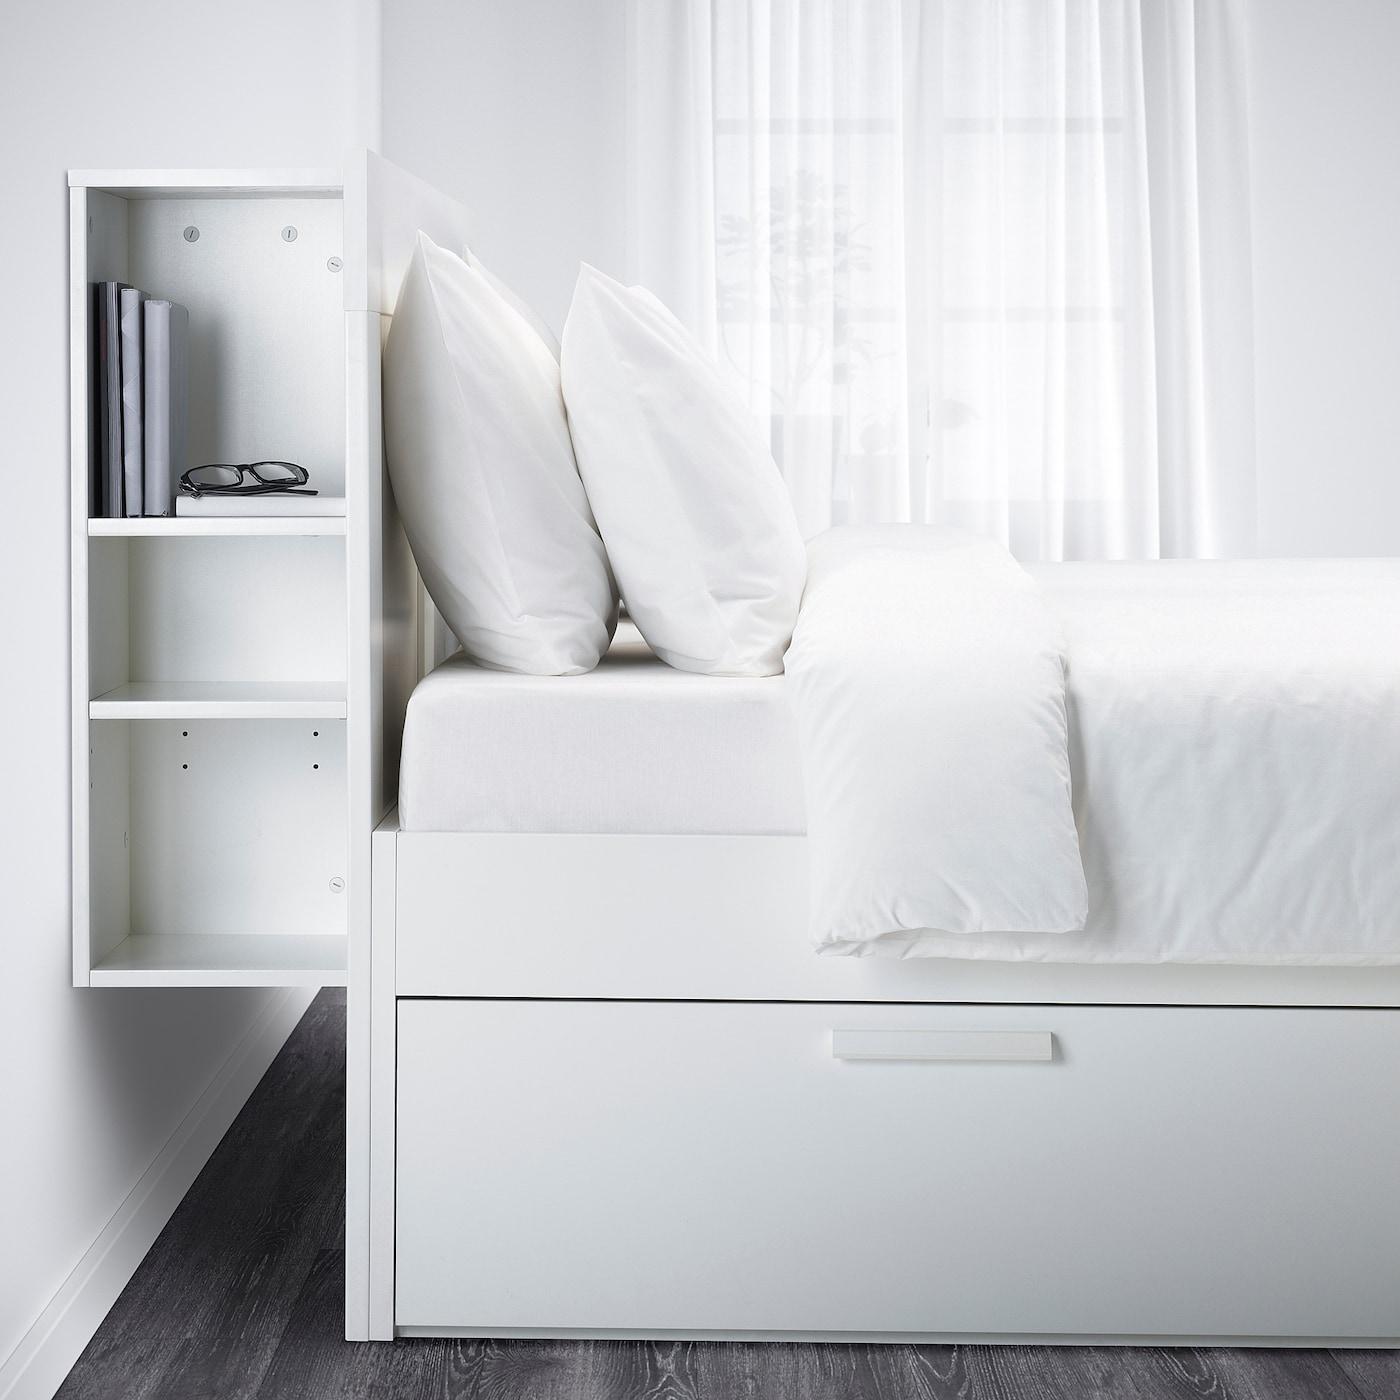 Full Size of Ikea Bett 140x200 Mit Schubladen Günstige Küche E Geräten 90x200 Weiß Kolonialstil Tojo Betten Outlet Lattenrost Und Matratze Cars 200x180 190x90 Erhöhtes Wohnzimmer Ikea Bett 140x200 Mit Schubladen